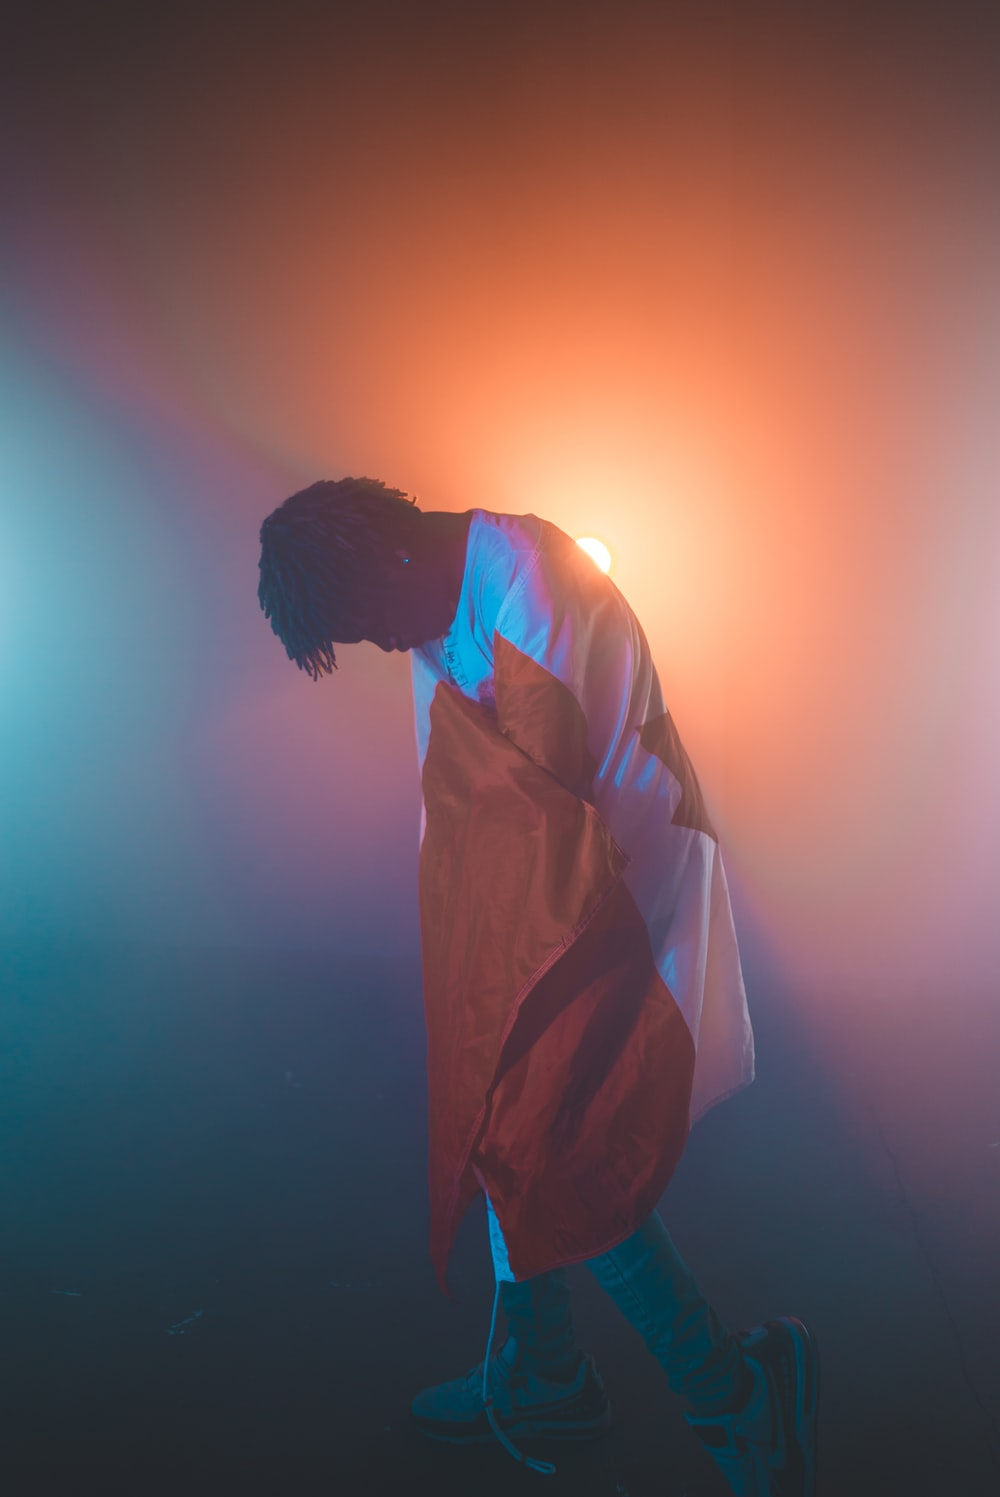 man wearing white and orange long-sleeved shirt standing near orange light